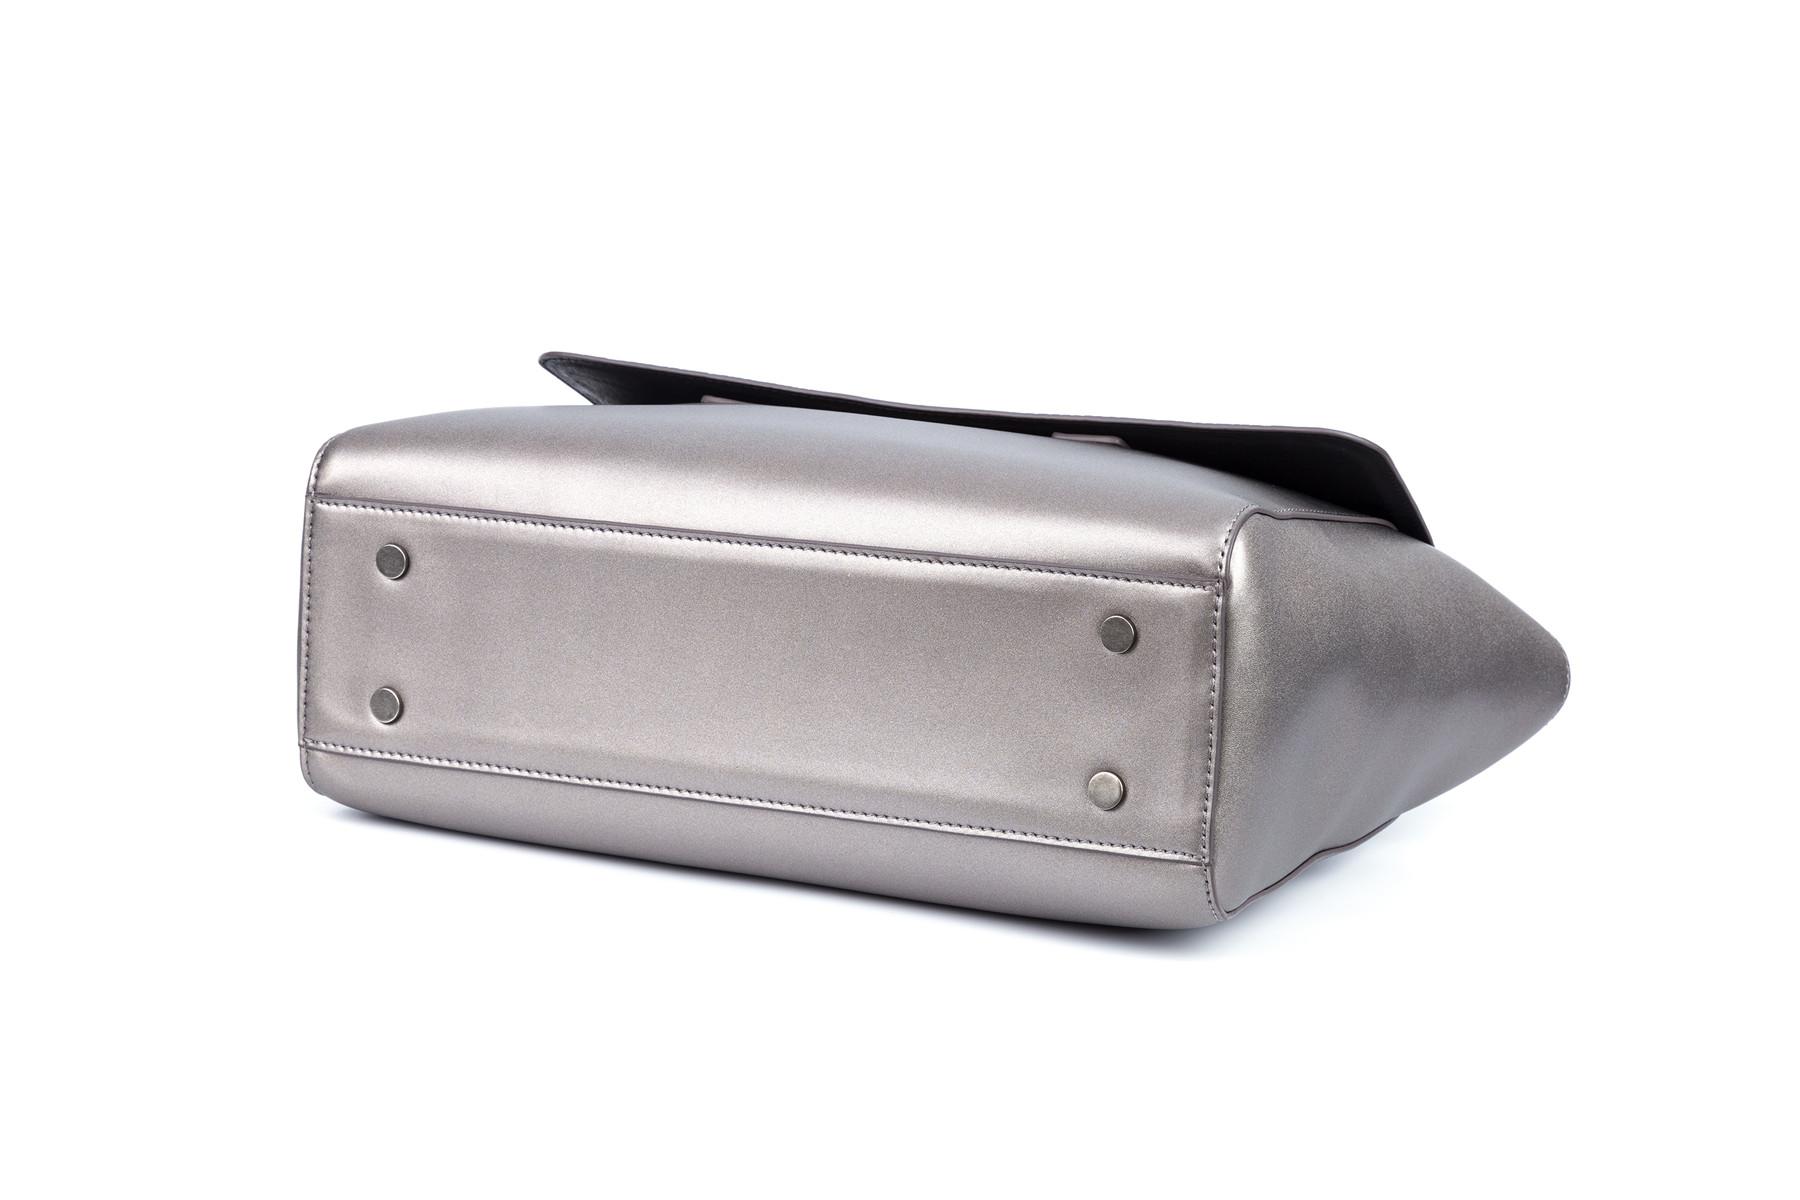 GF bags-Bulk Luxury Handbags Manufacturer, Affordable Handbags   Gf Bags-5